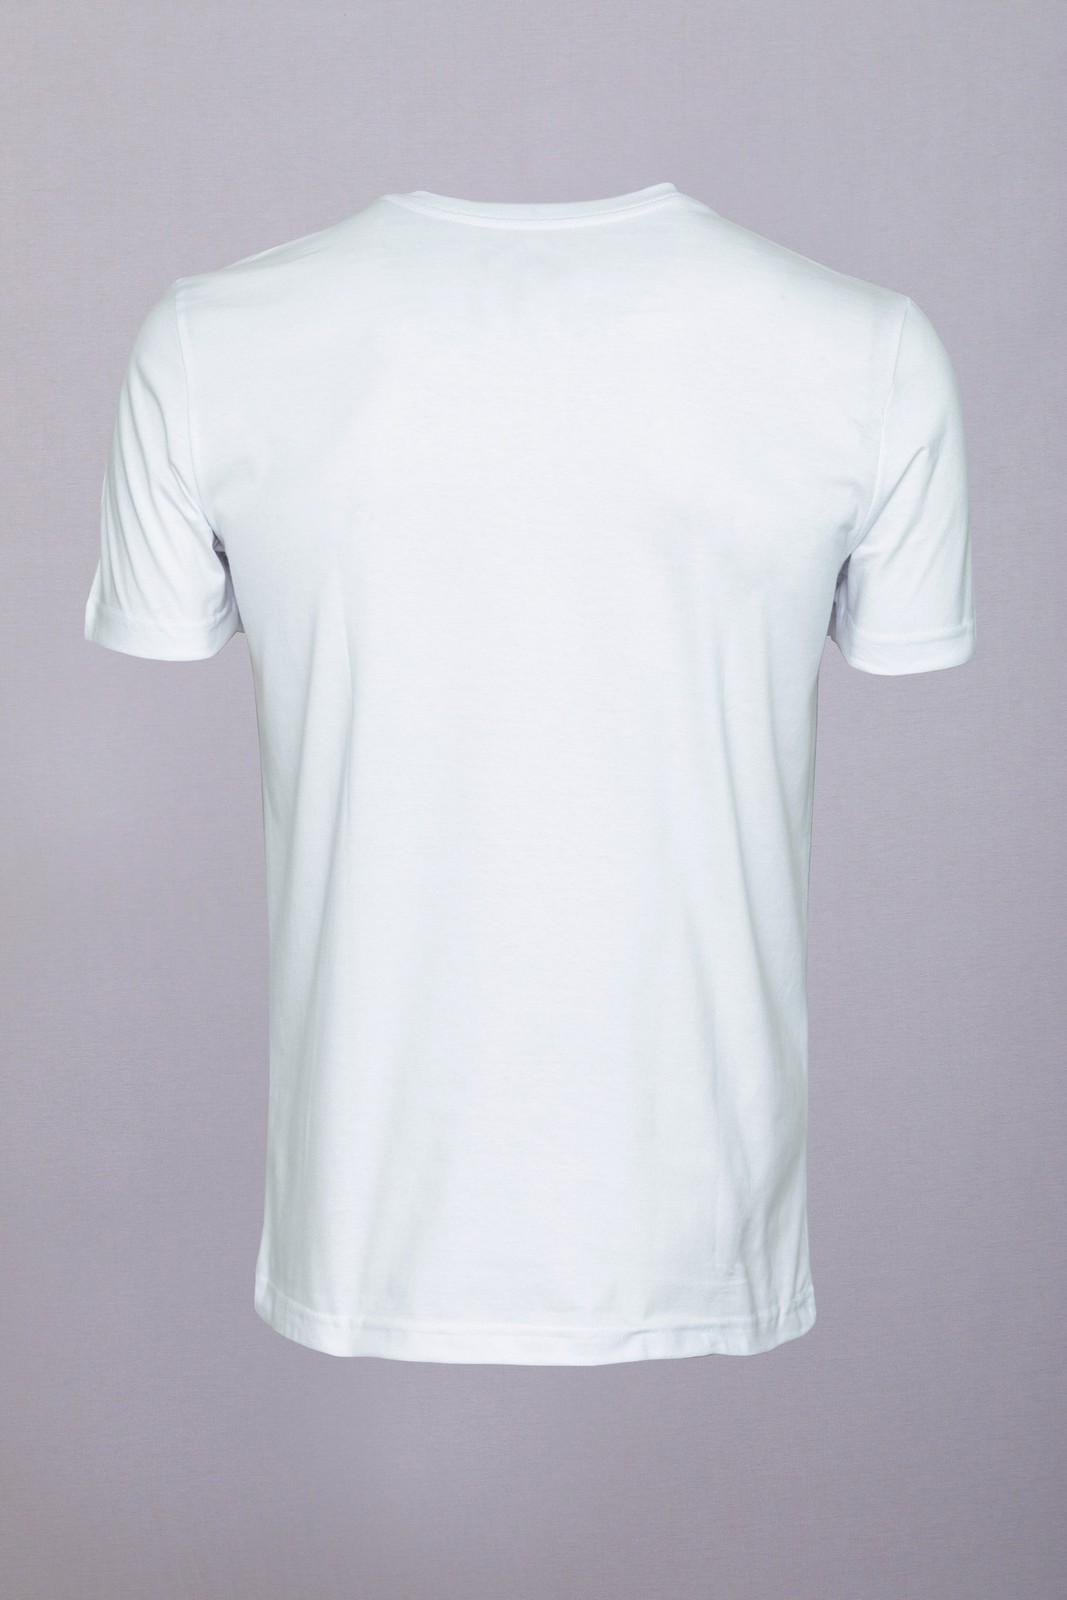 Camiseta CoolWave Special Bikes Branca